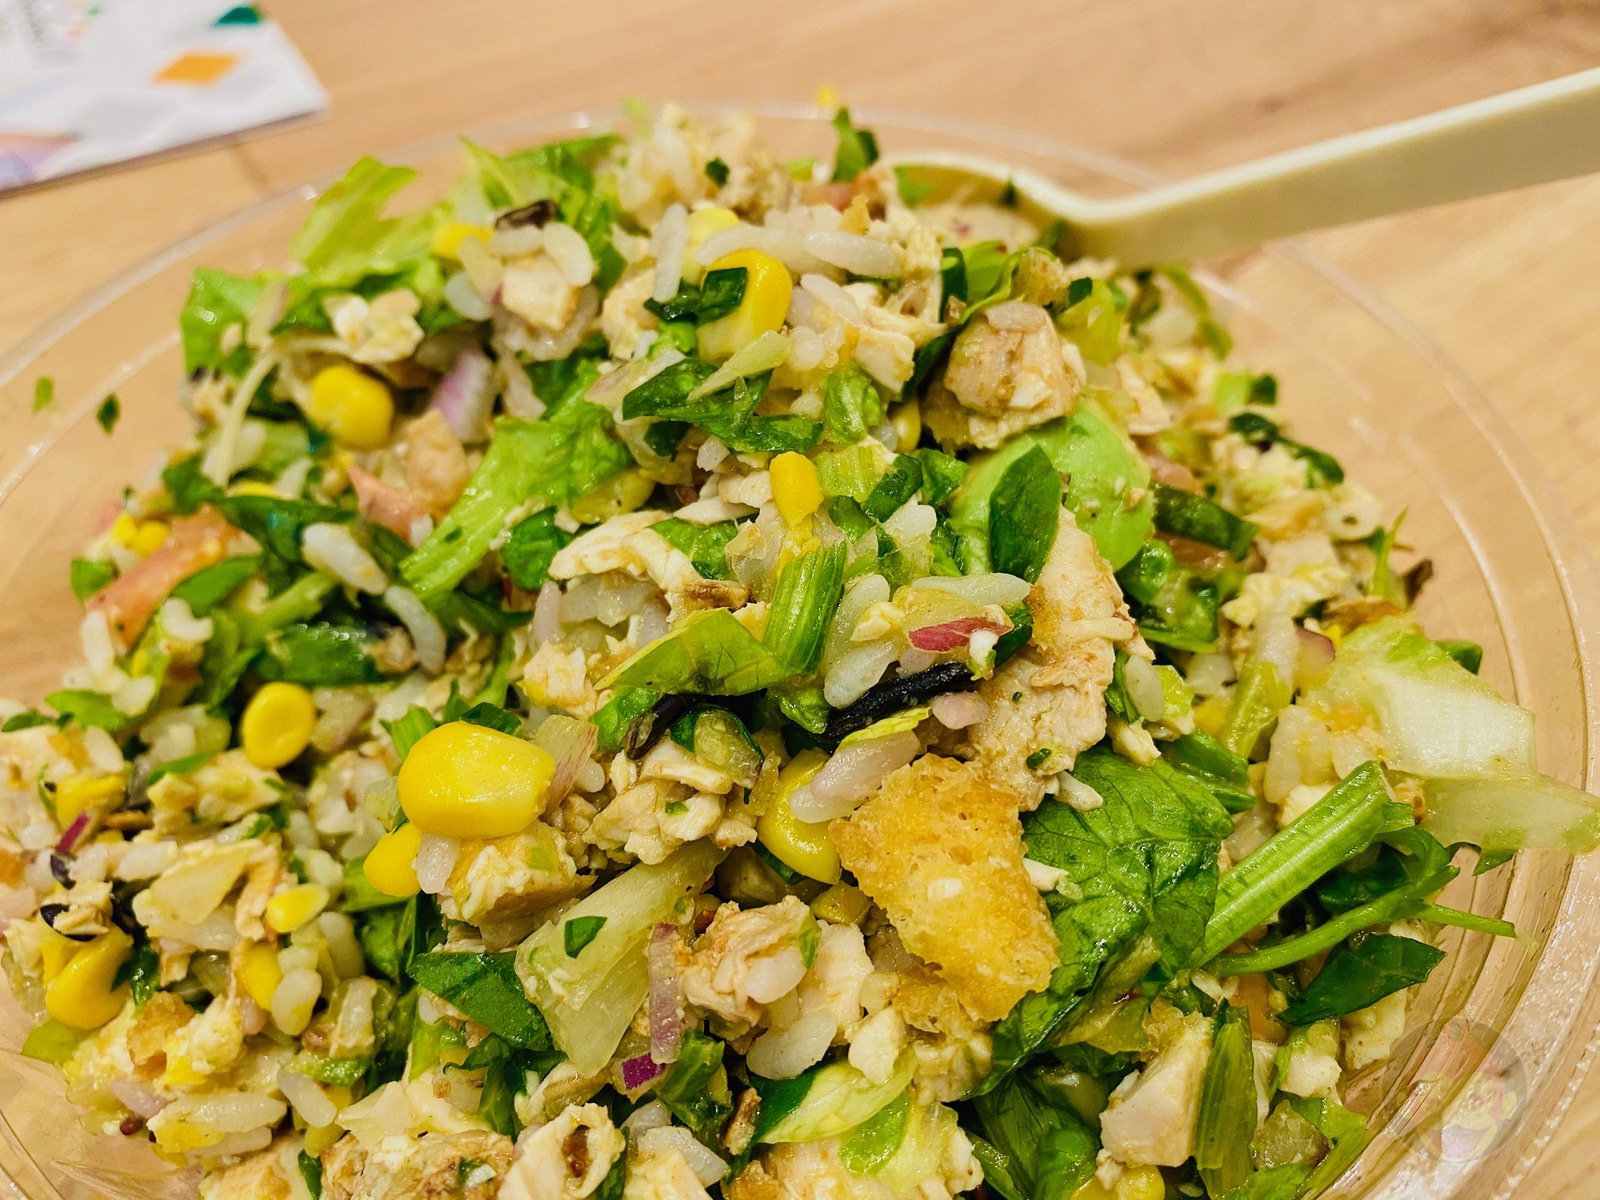 Crisp-Salad-Works-Grandberry-Park-Minamimachida-07.jpeg